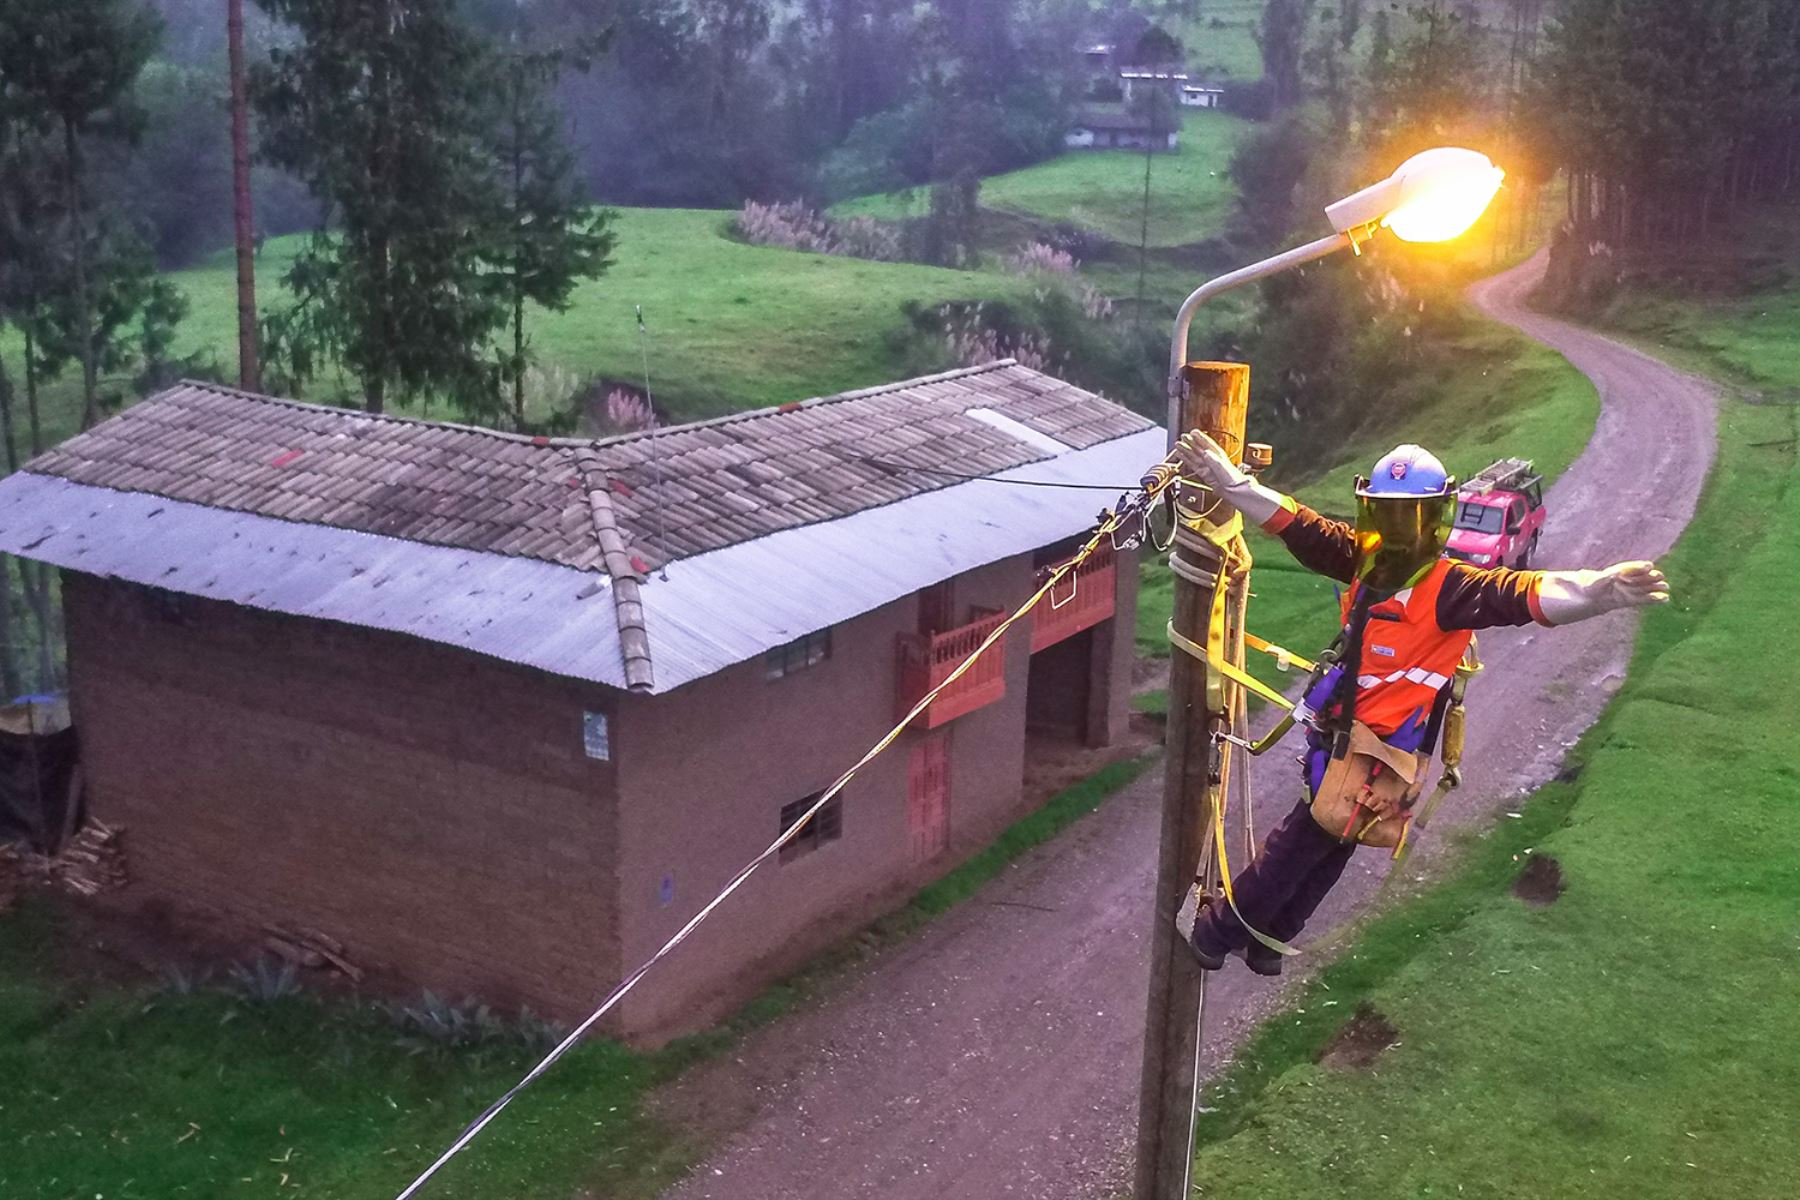 Electrificación rural. Foto: Cortesía